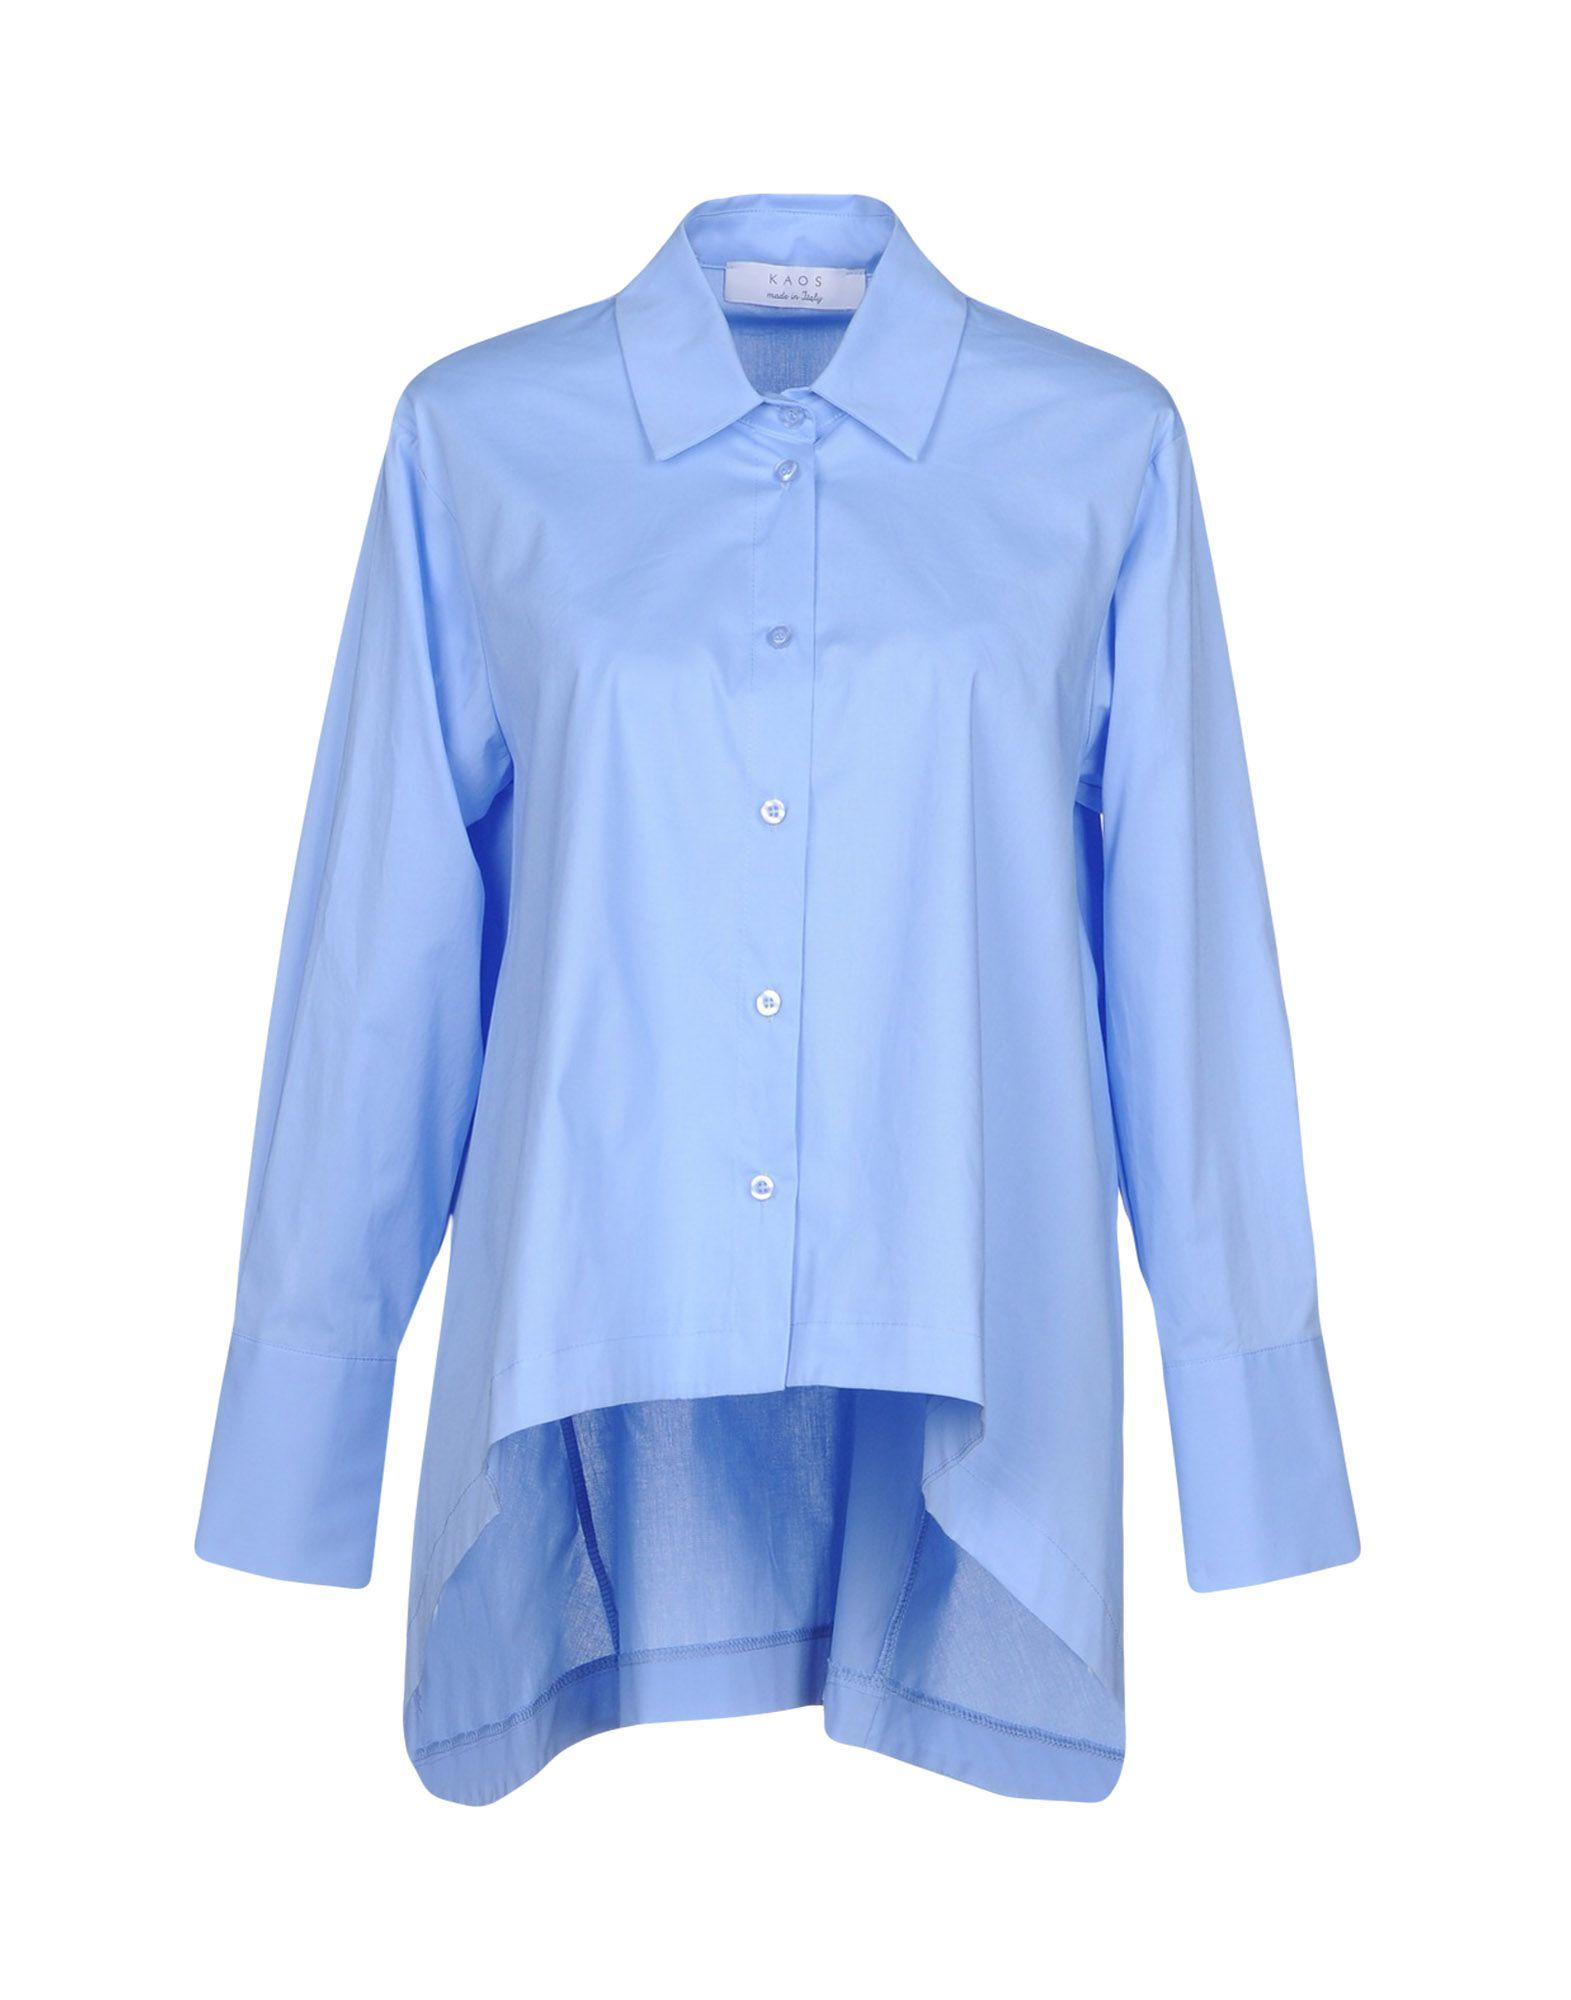 SHIRTS Kaos Sky blue Woman Cotton